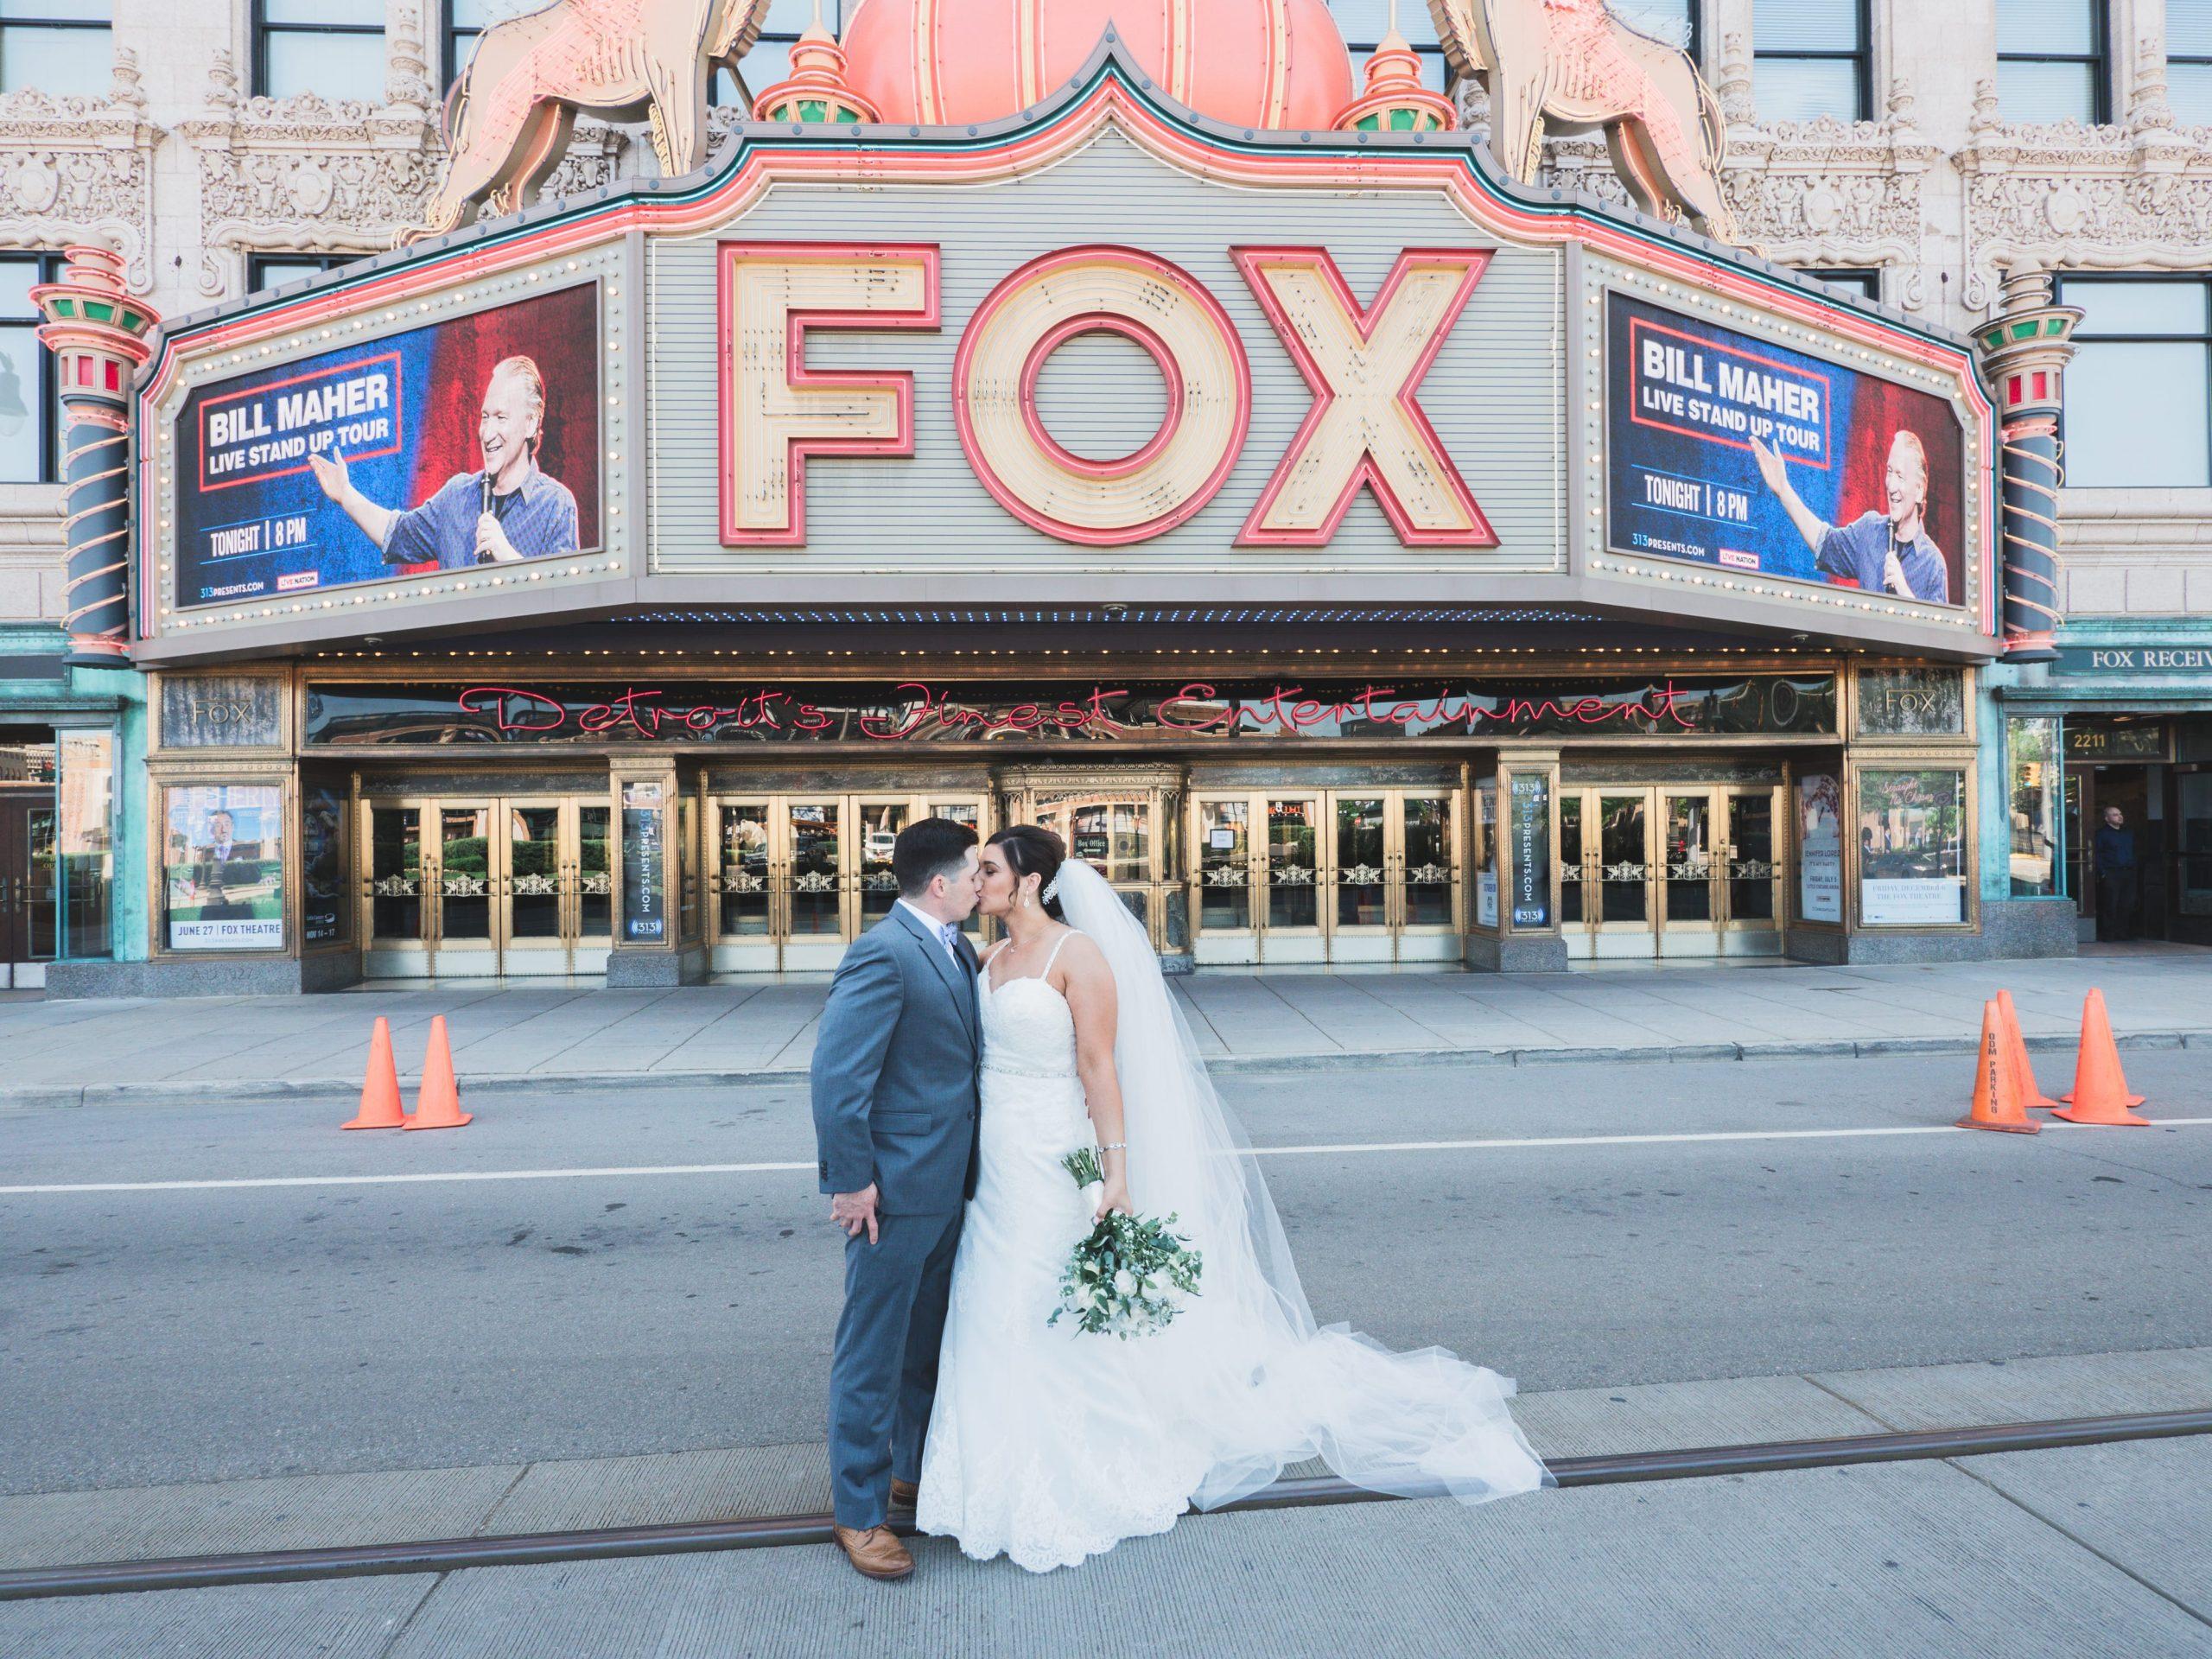 Detroit fox theatre wedding photography